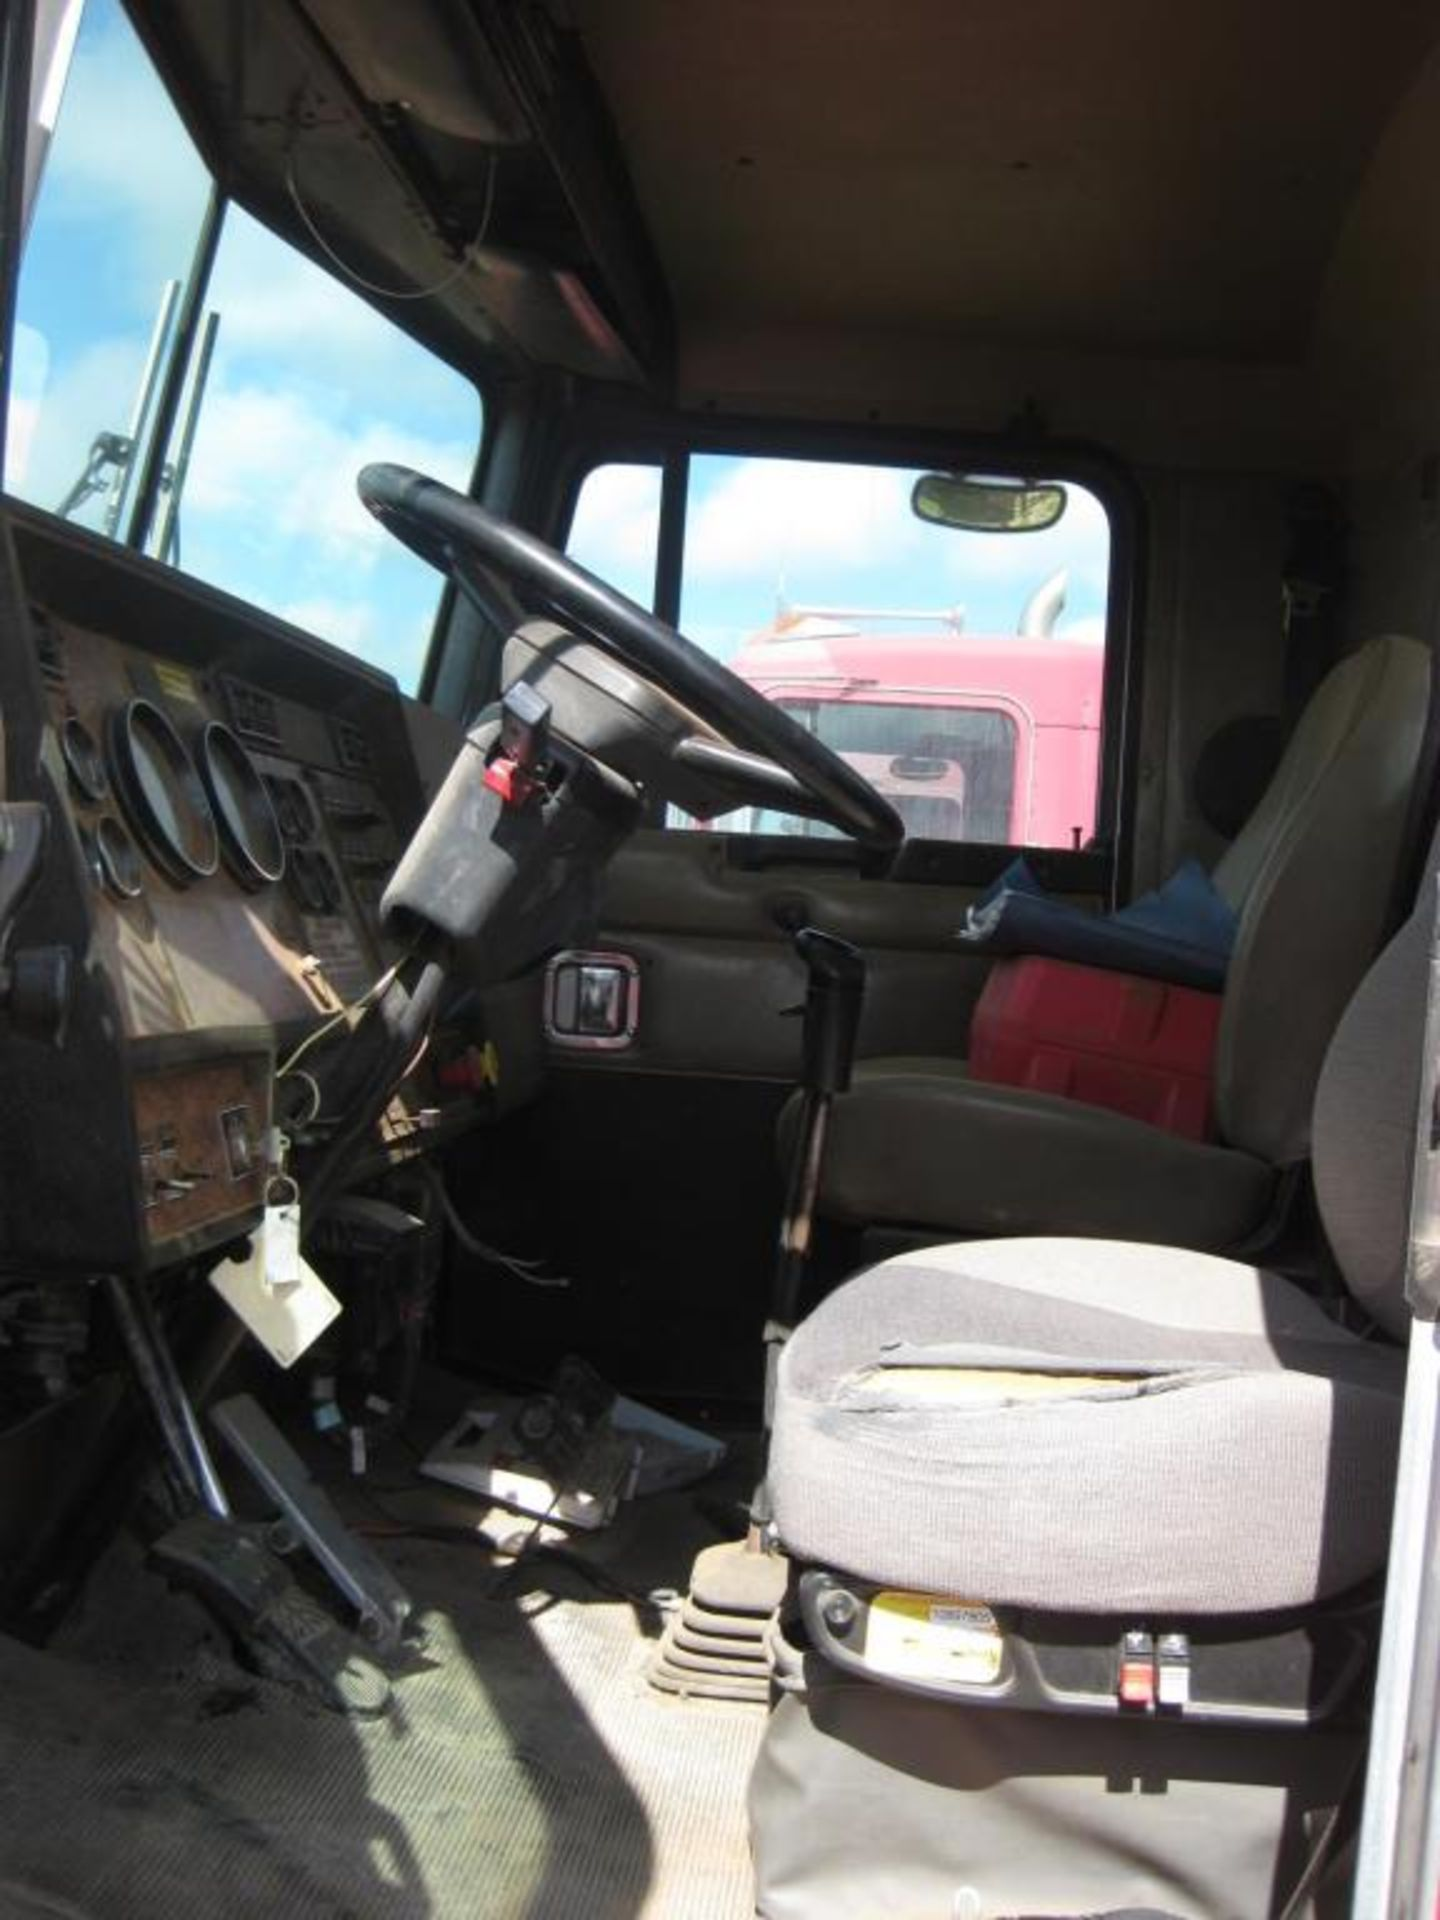 Kenworth Winch Truck - Image 13 of 23